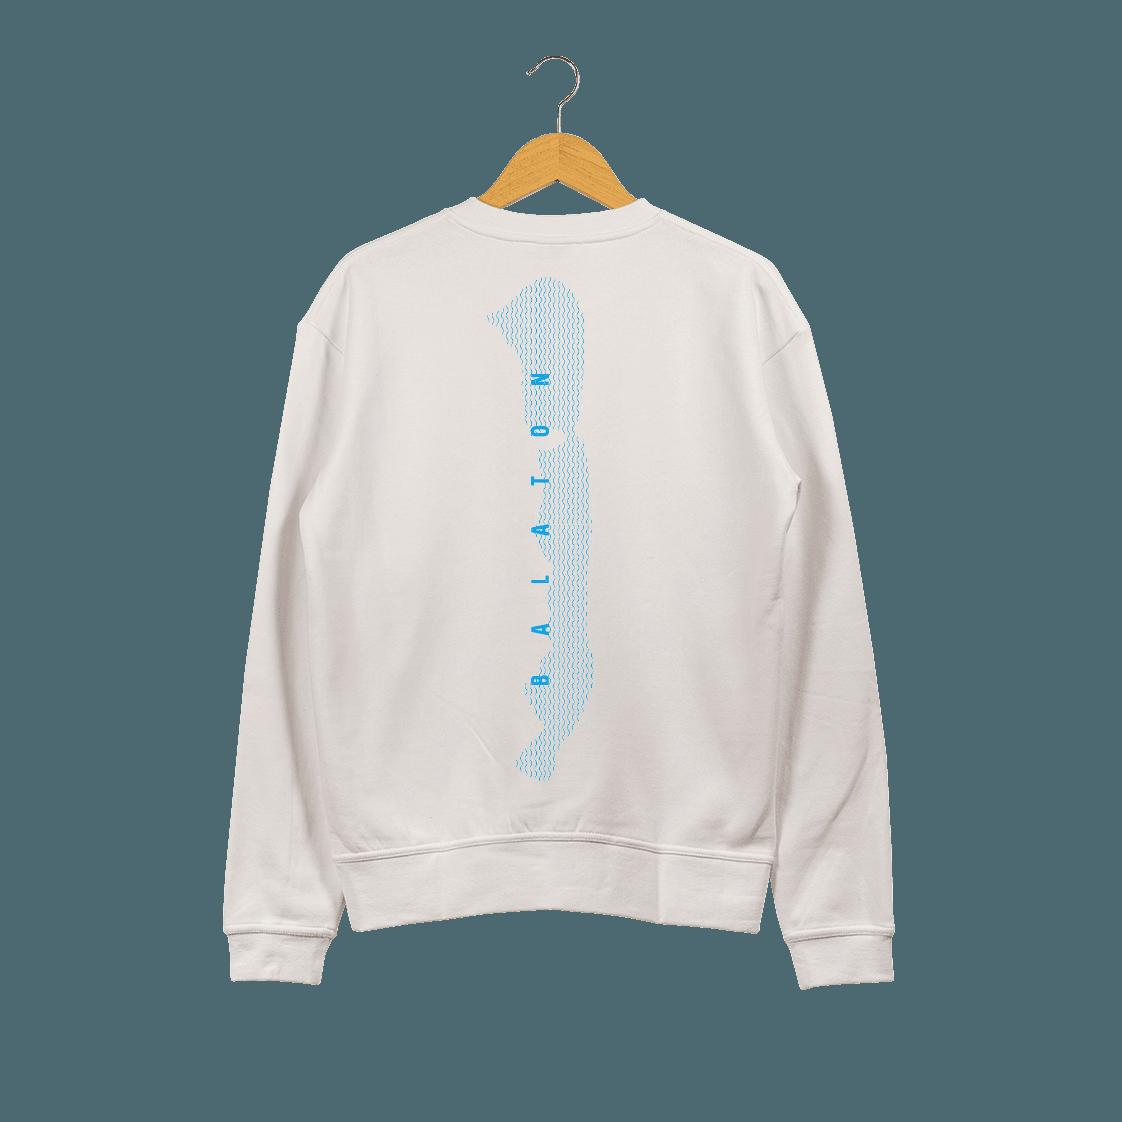 Balaton (férfi pulóver)